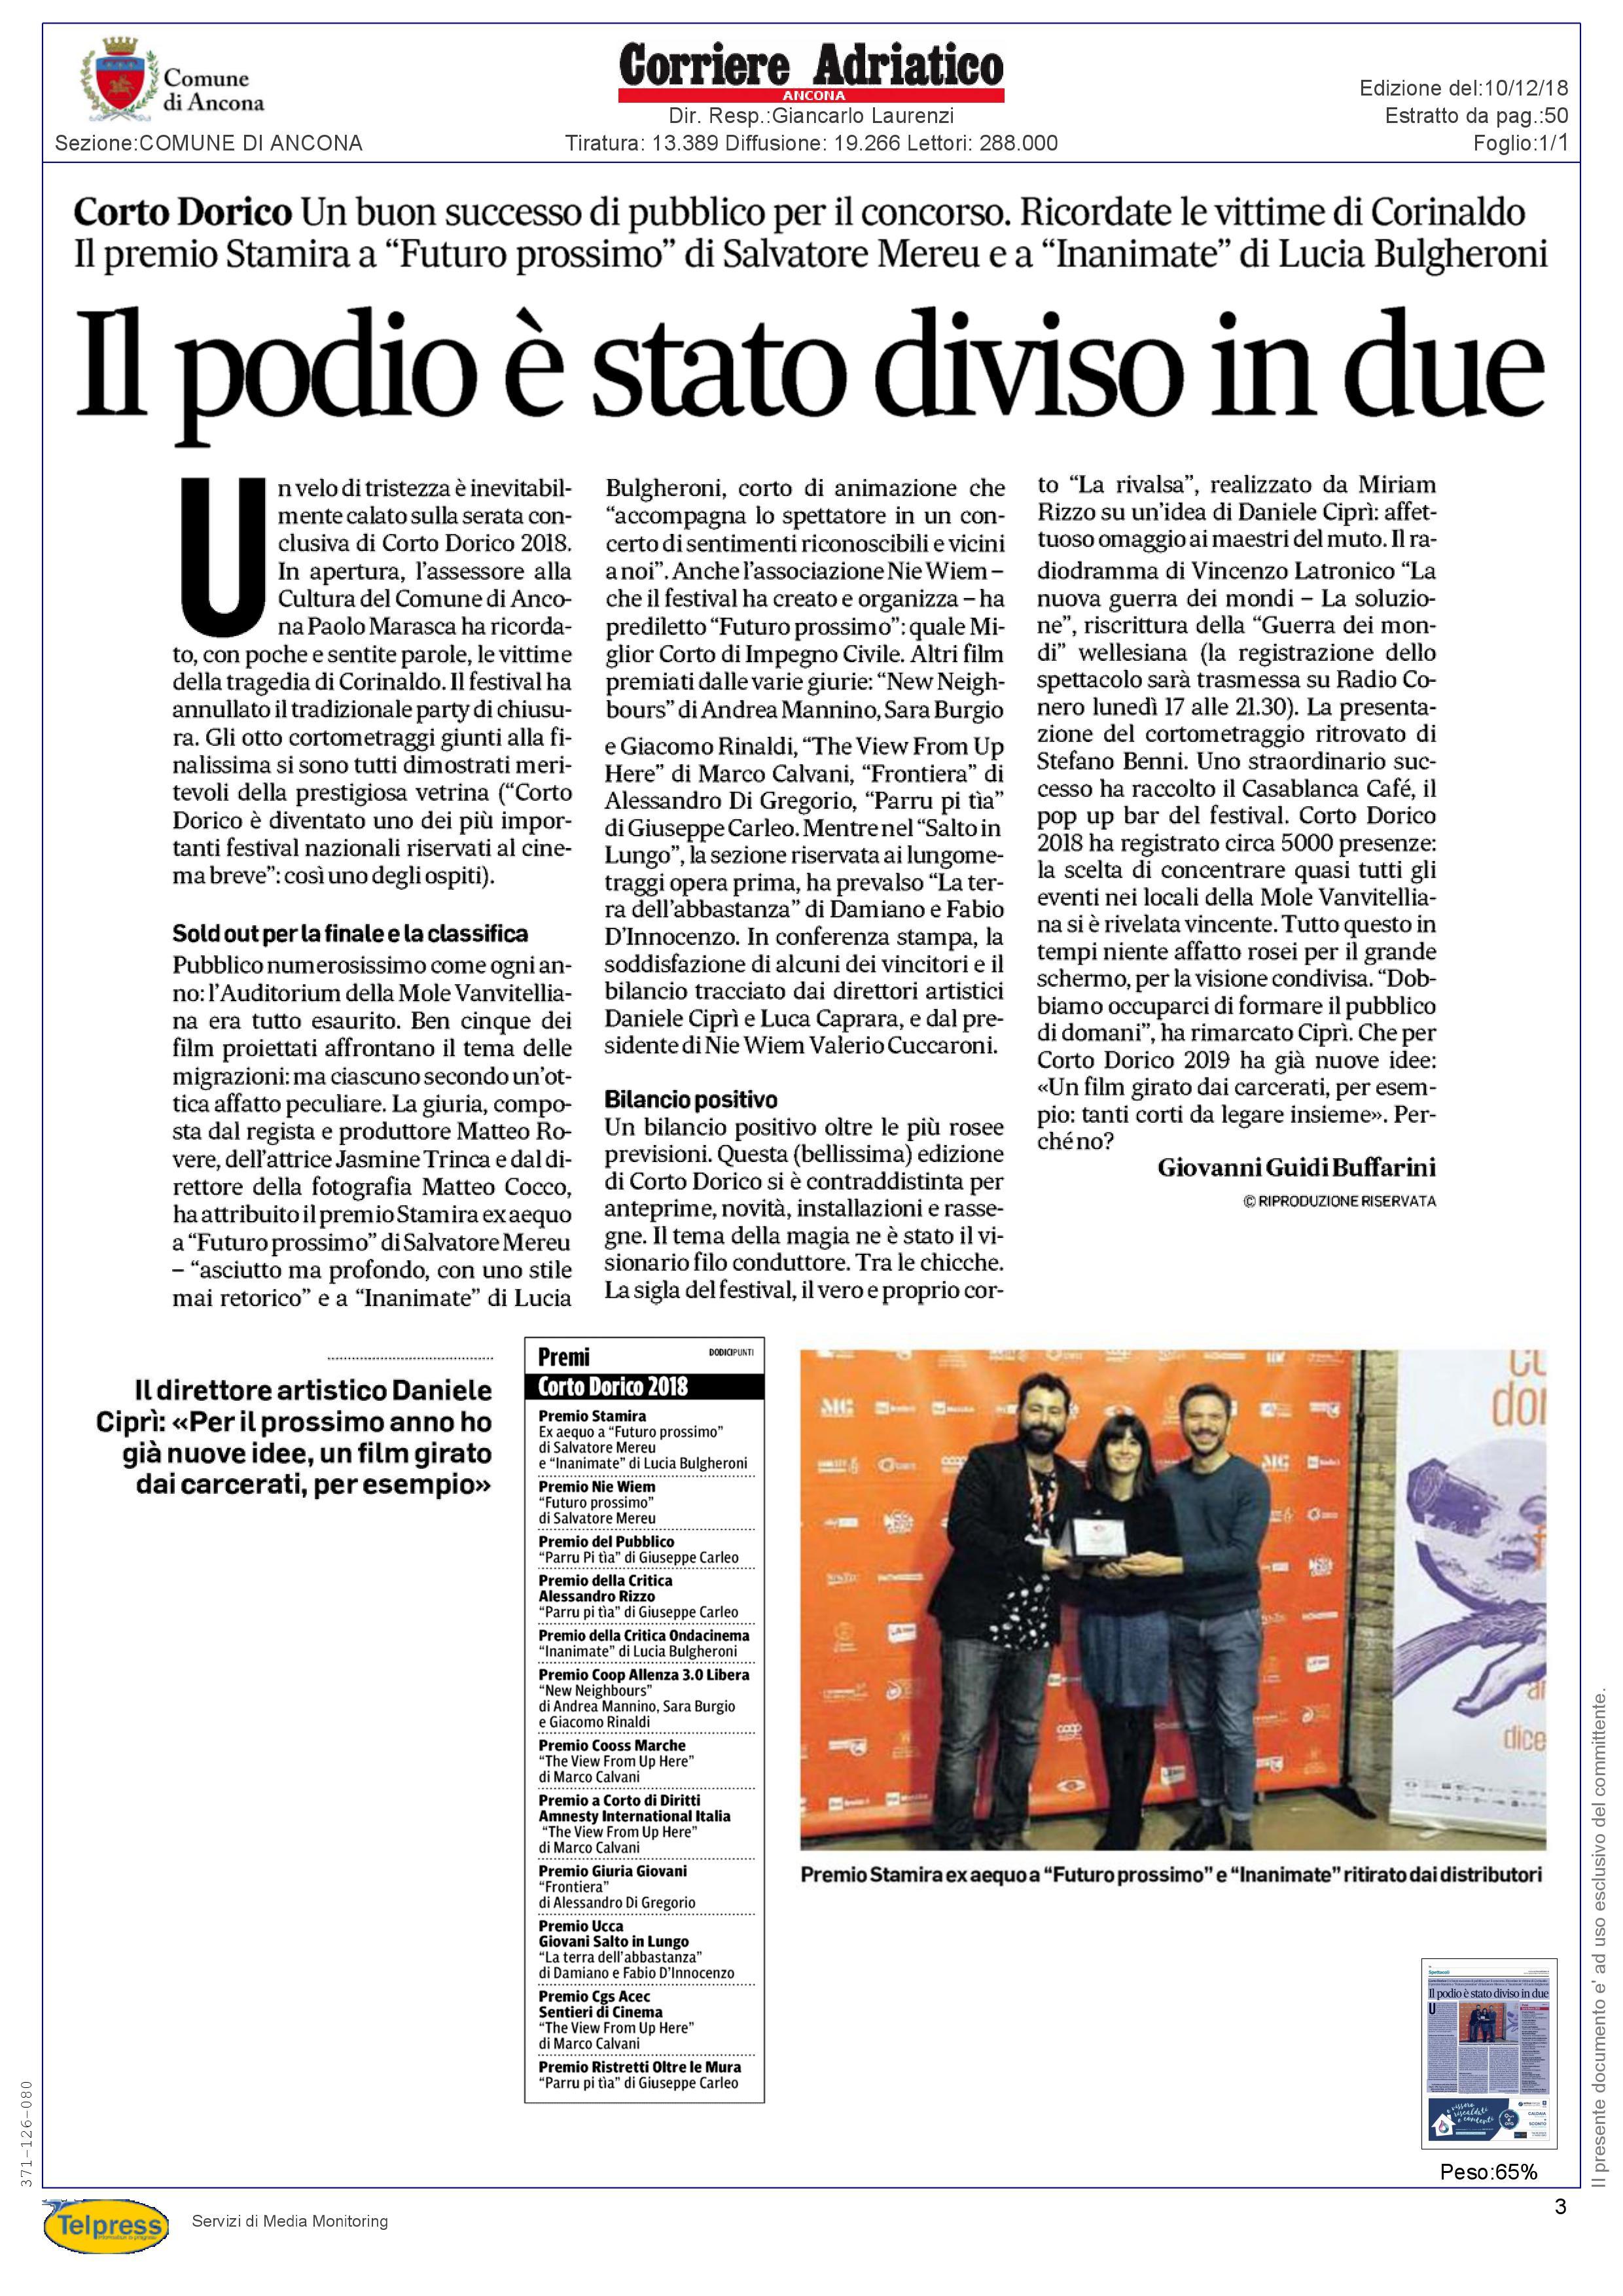 10-12-18 Corriere Adriatico